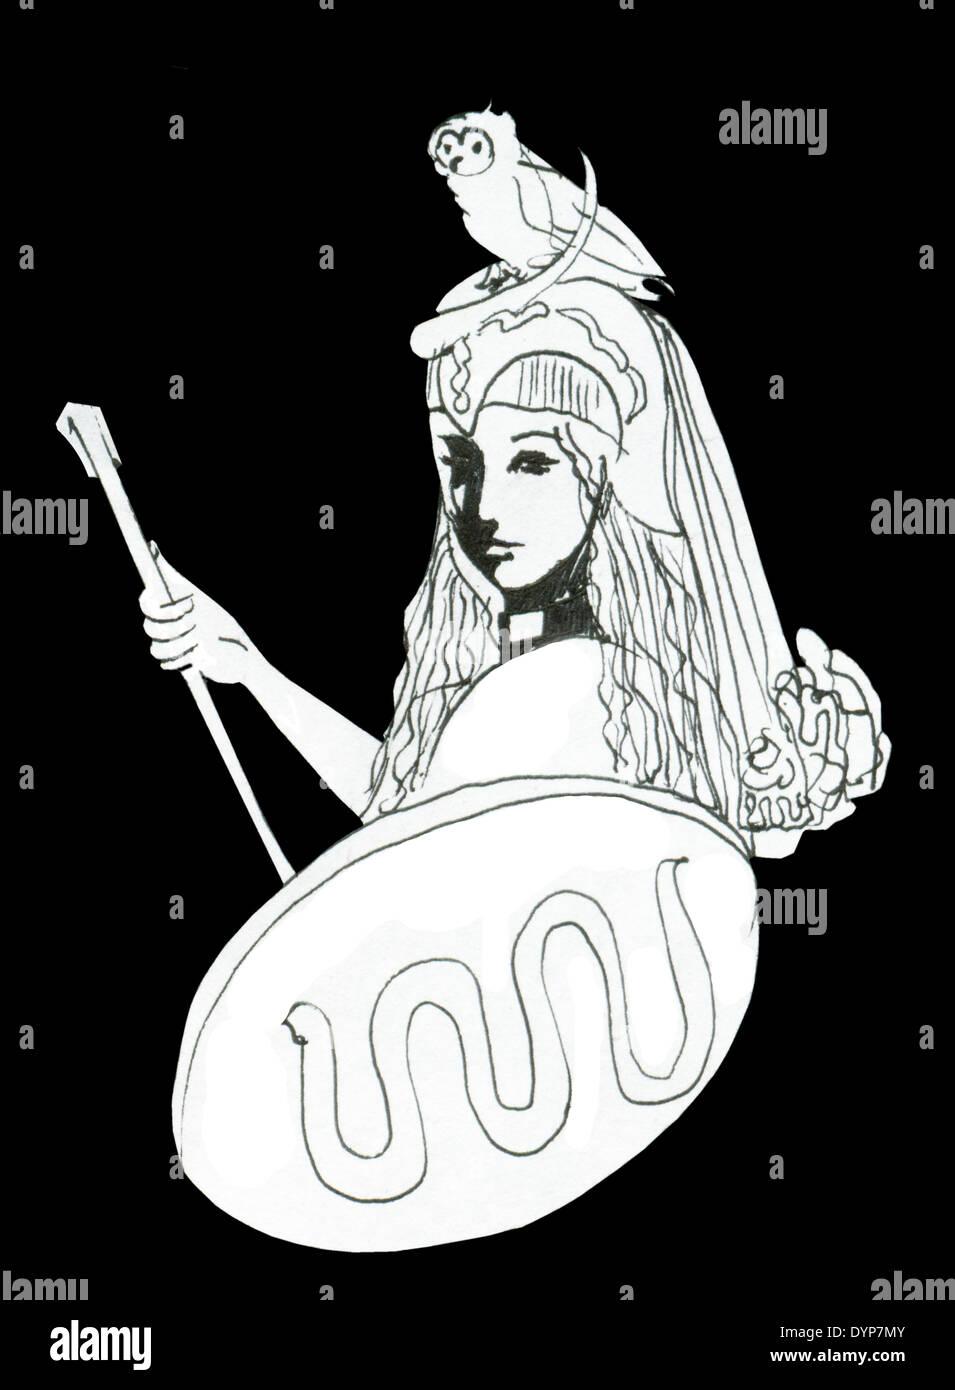 Pallas athena goddess symbol of wisdom intellect creativity and pallas athena goddess symbol of wisdom intellect creativity and strength for example ink drawing with attributes biocorpaavc